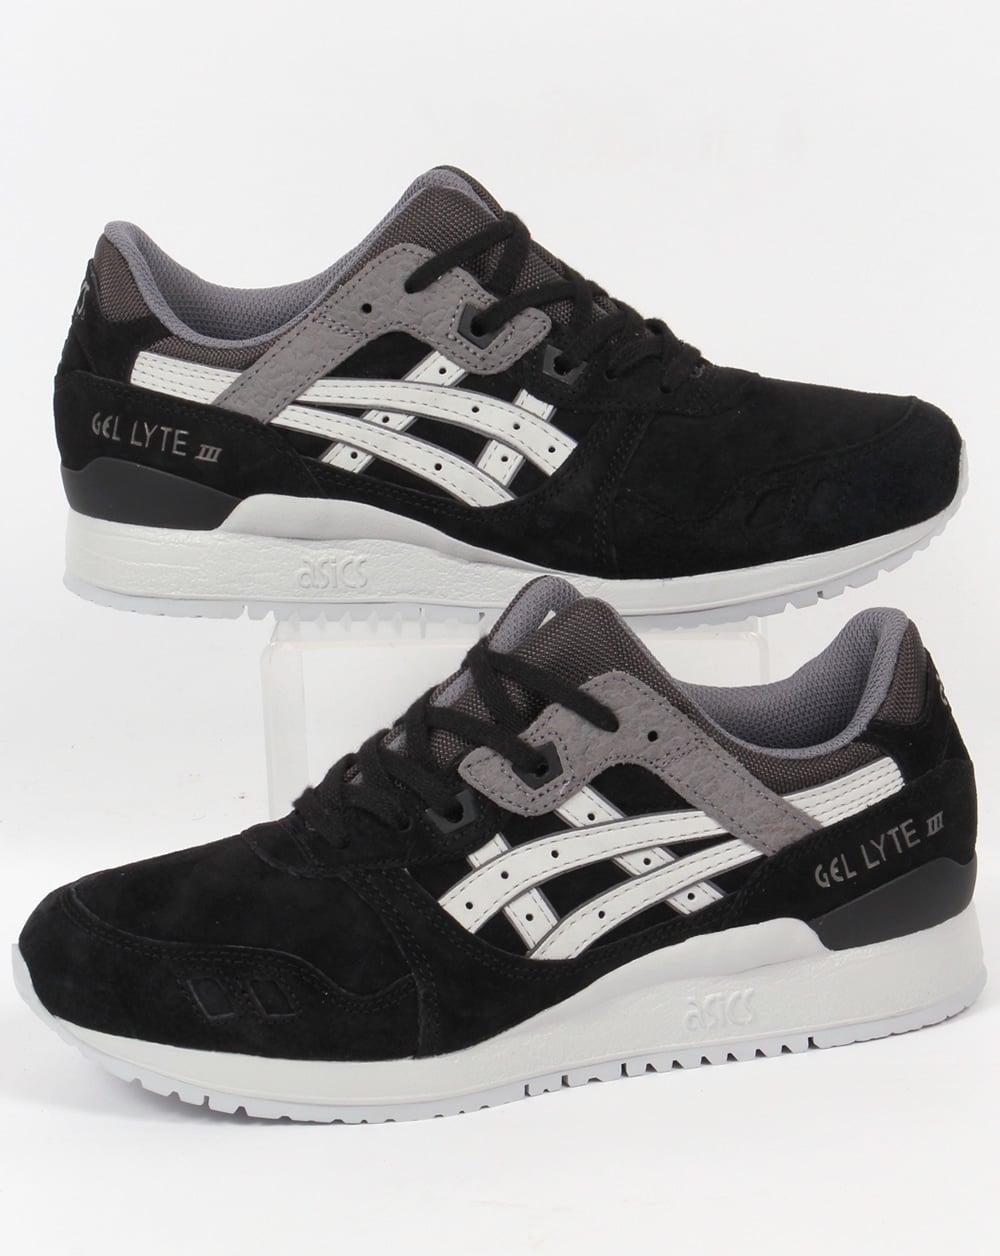 asics black and grey